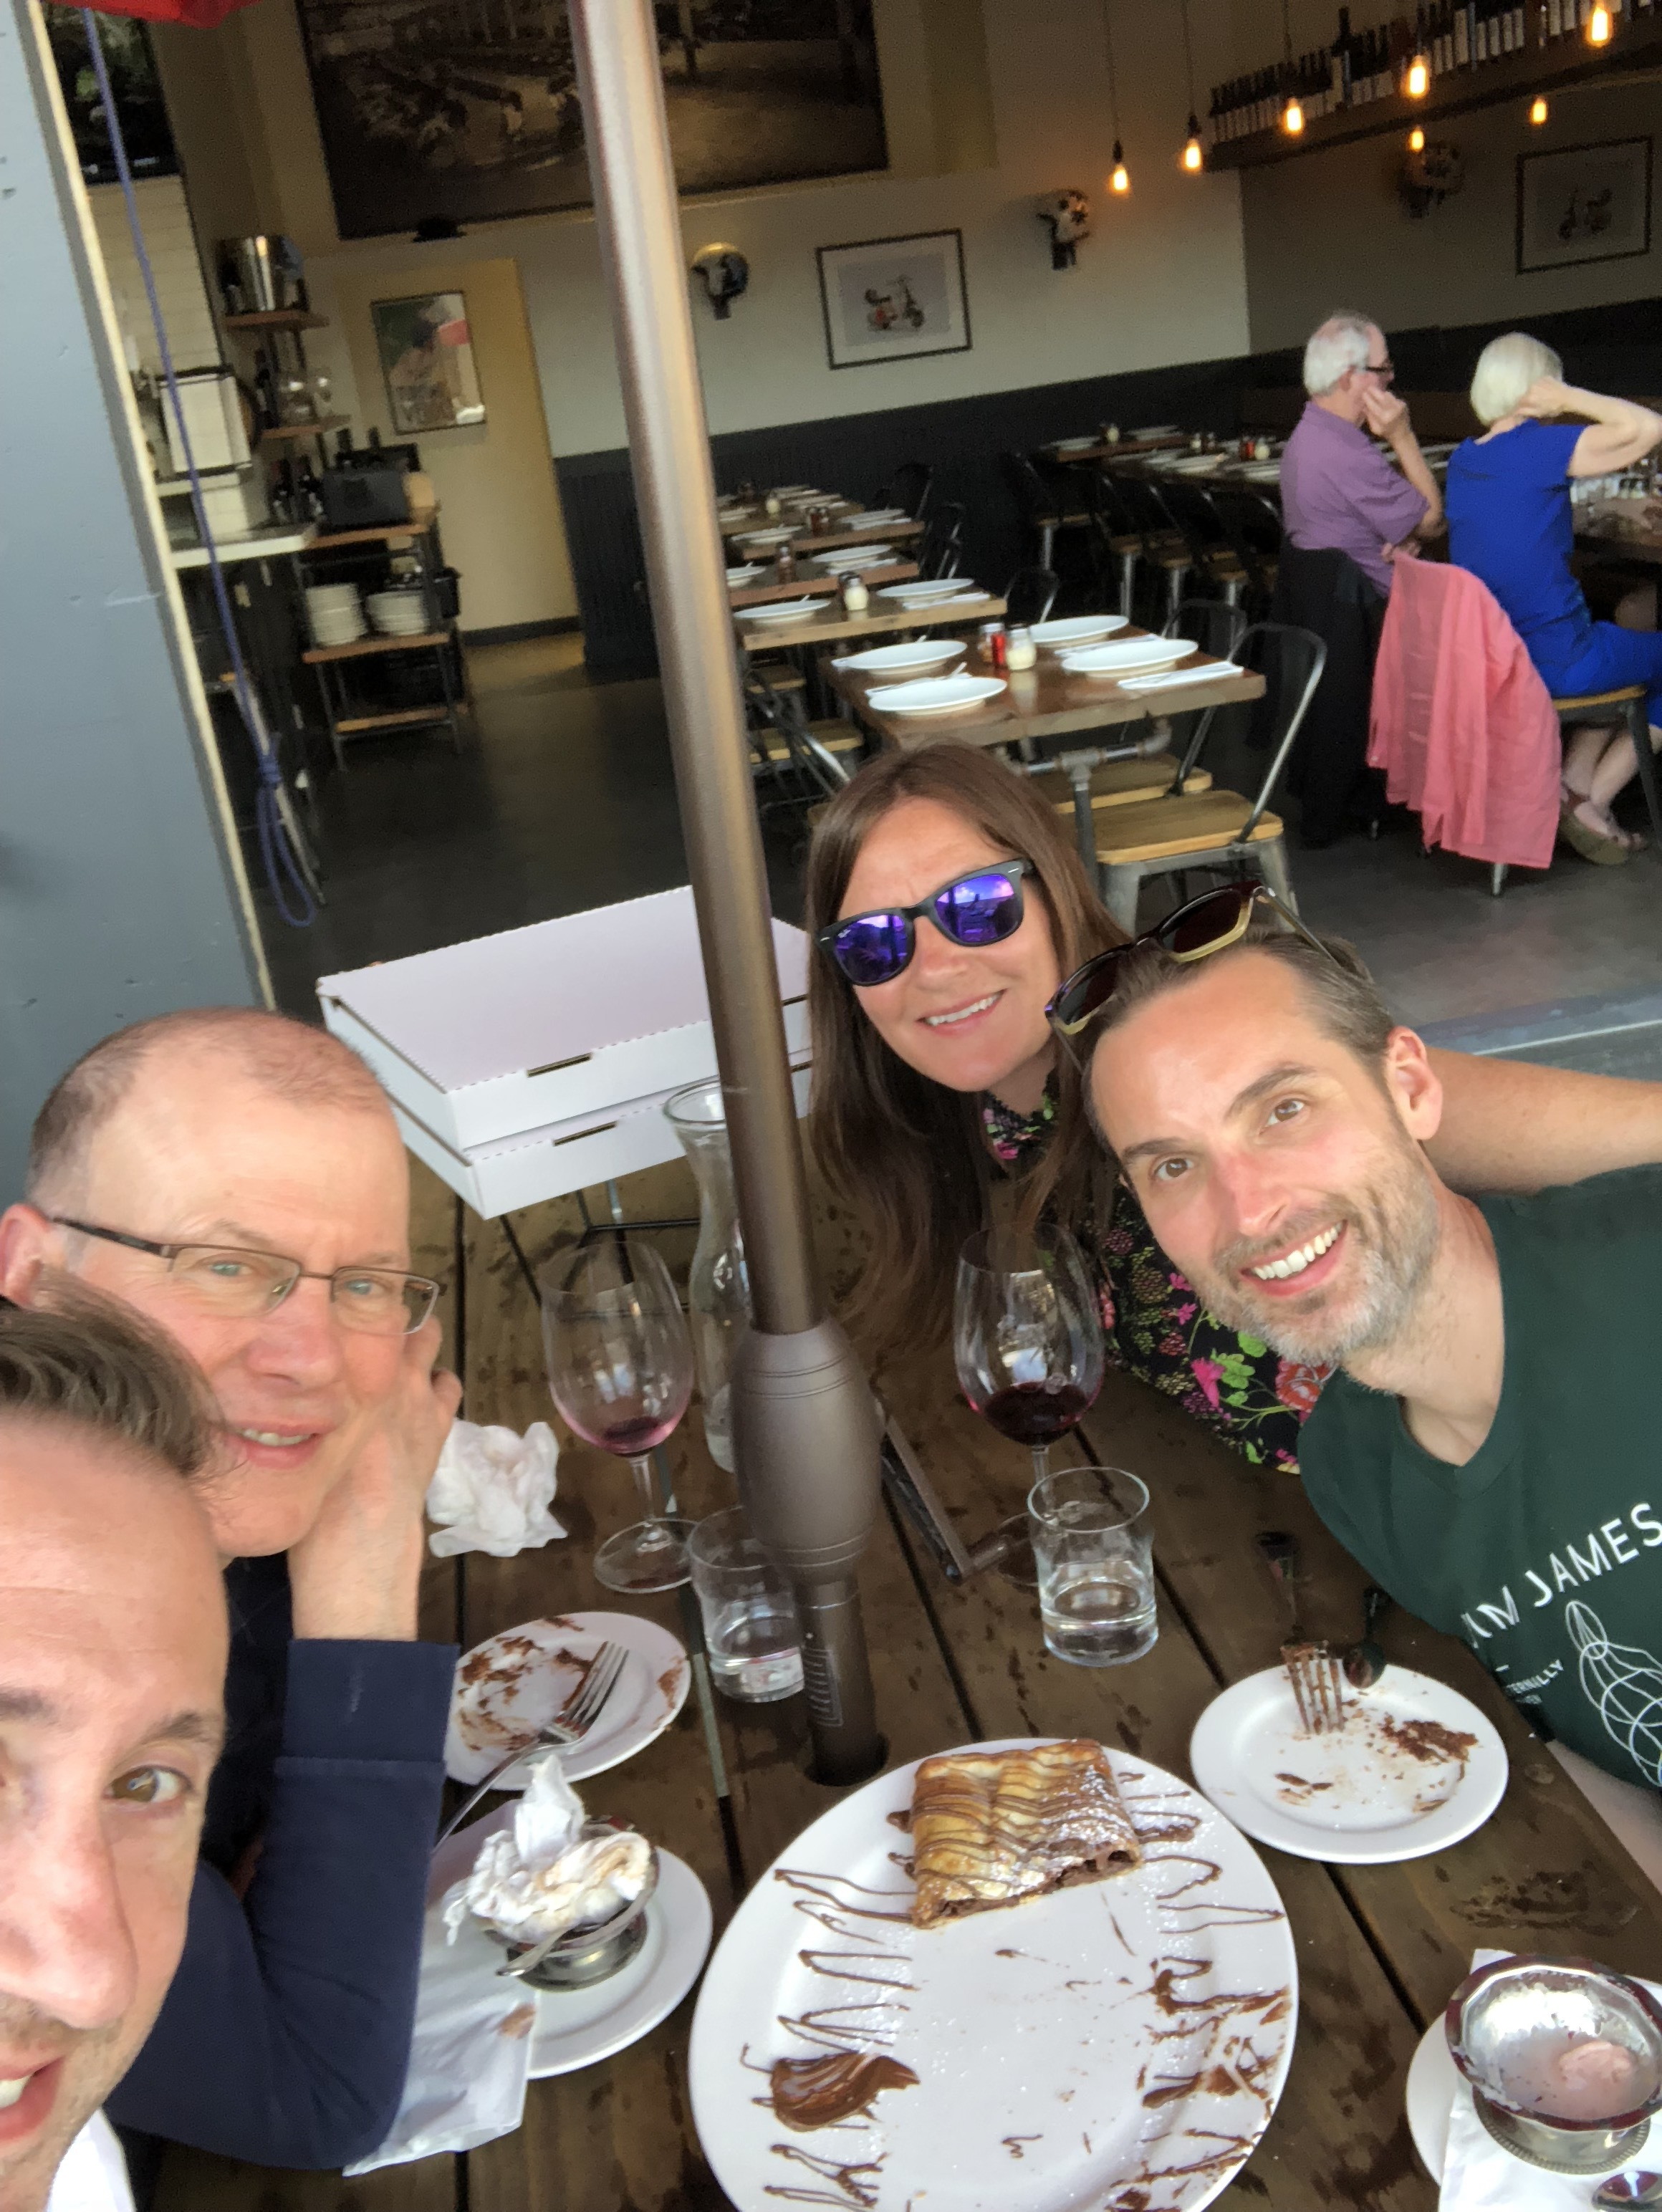 4 Happy People! - Even dessert was incredible!